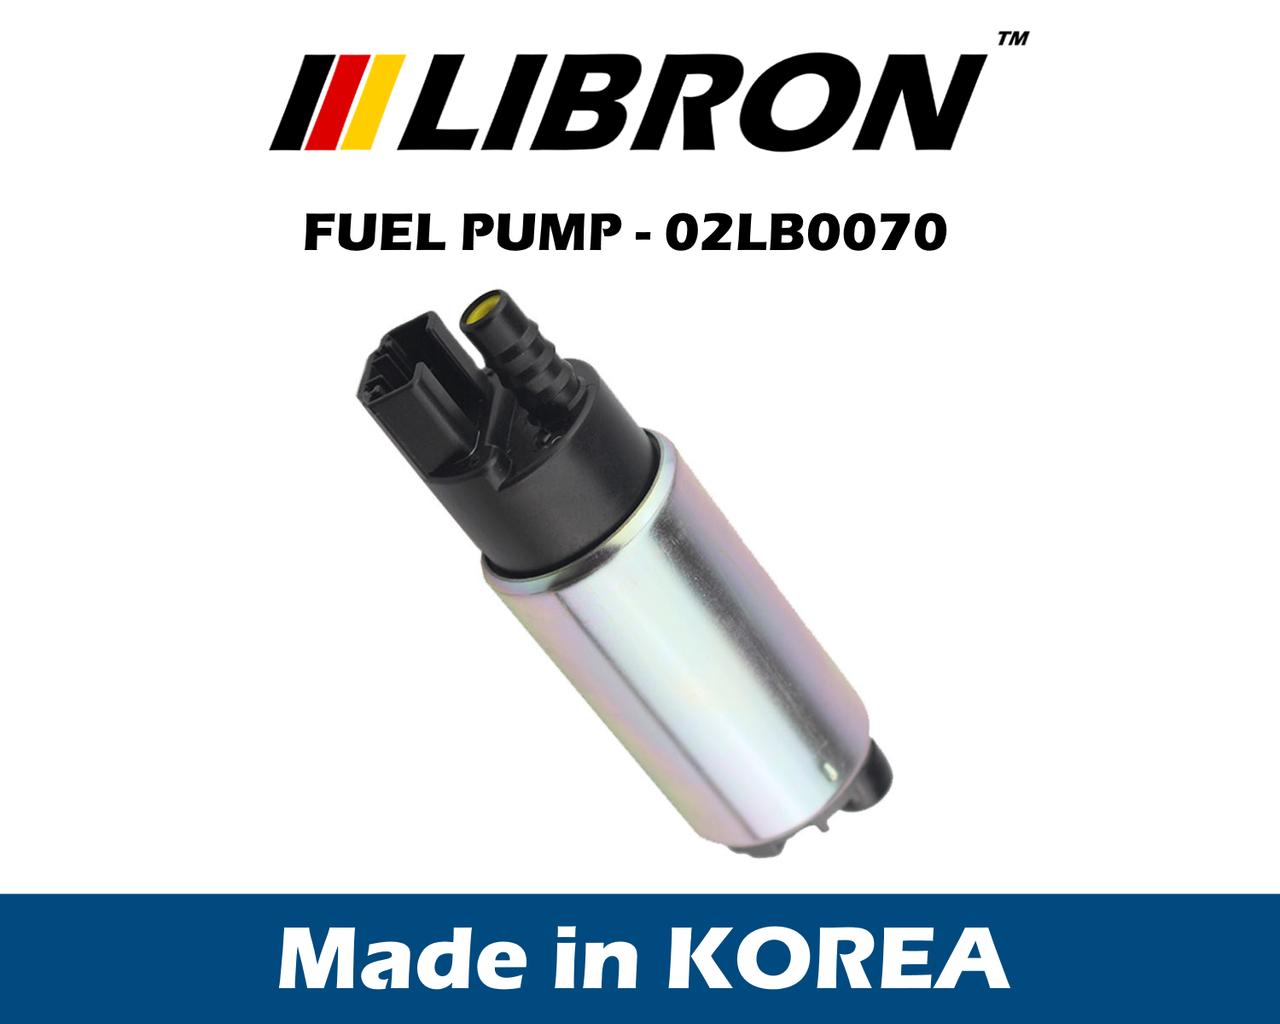 Бензонасос LIBRON 02LB0070 - Honda ACCORD VI (1996-1998)